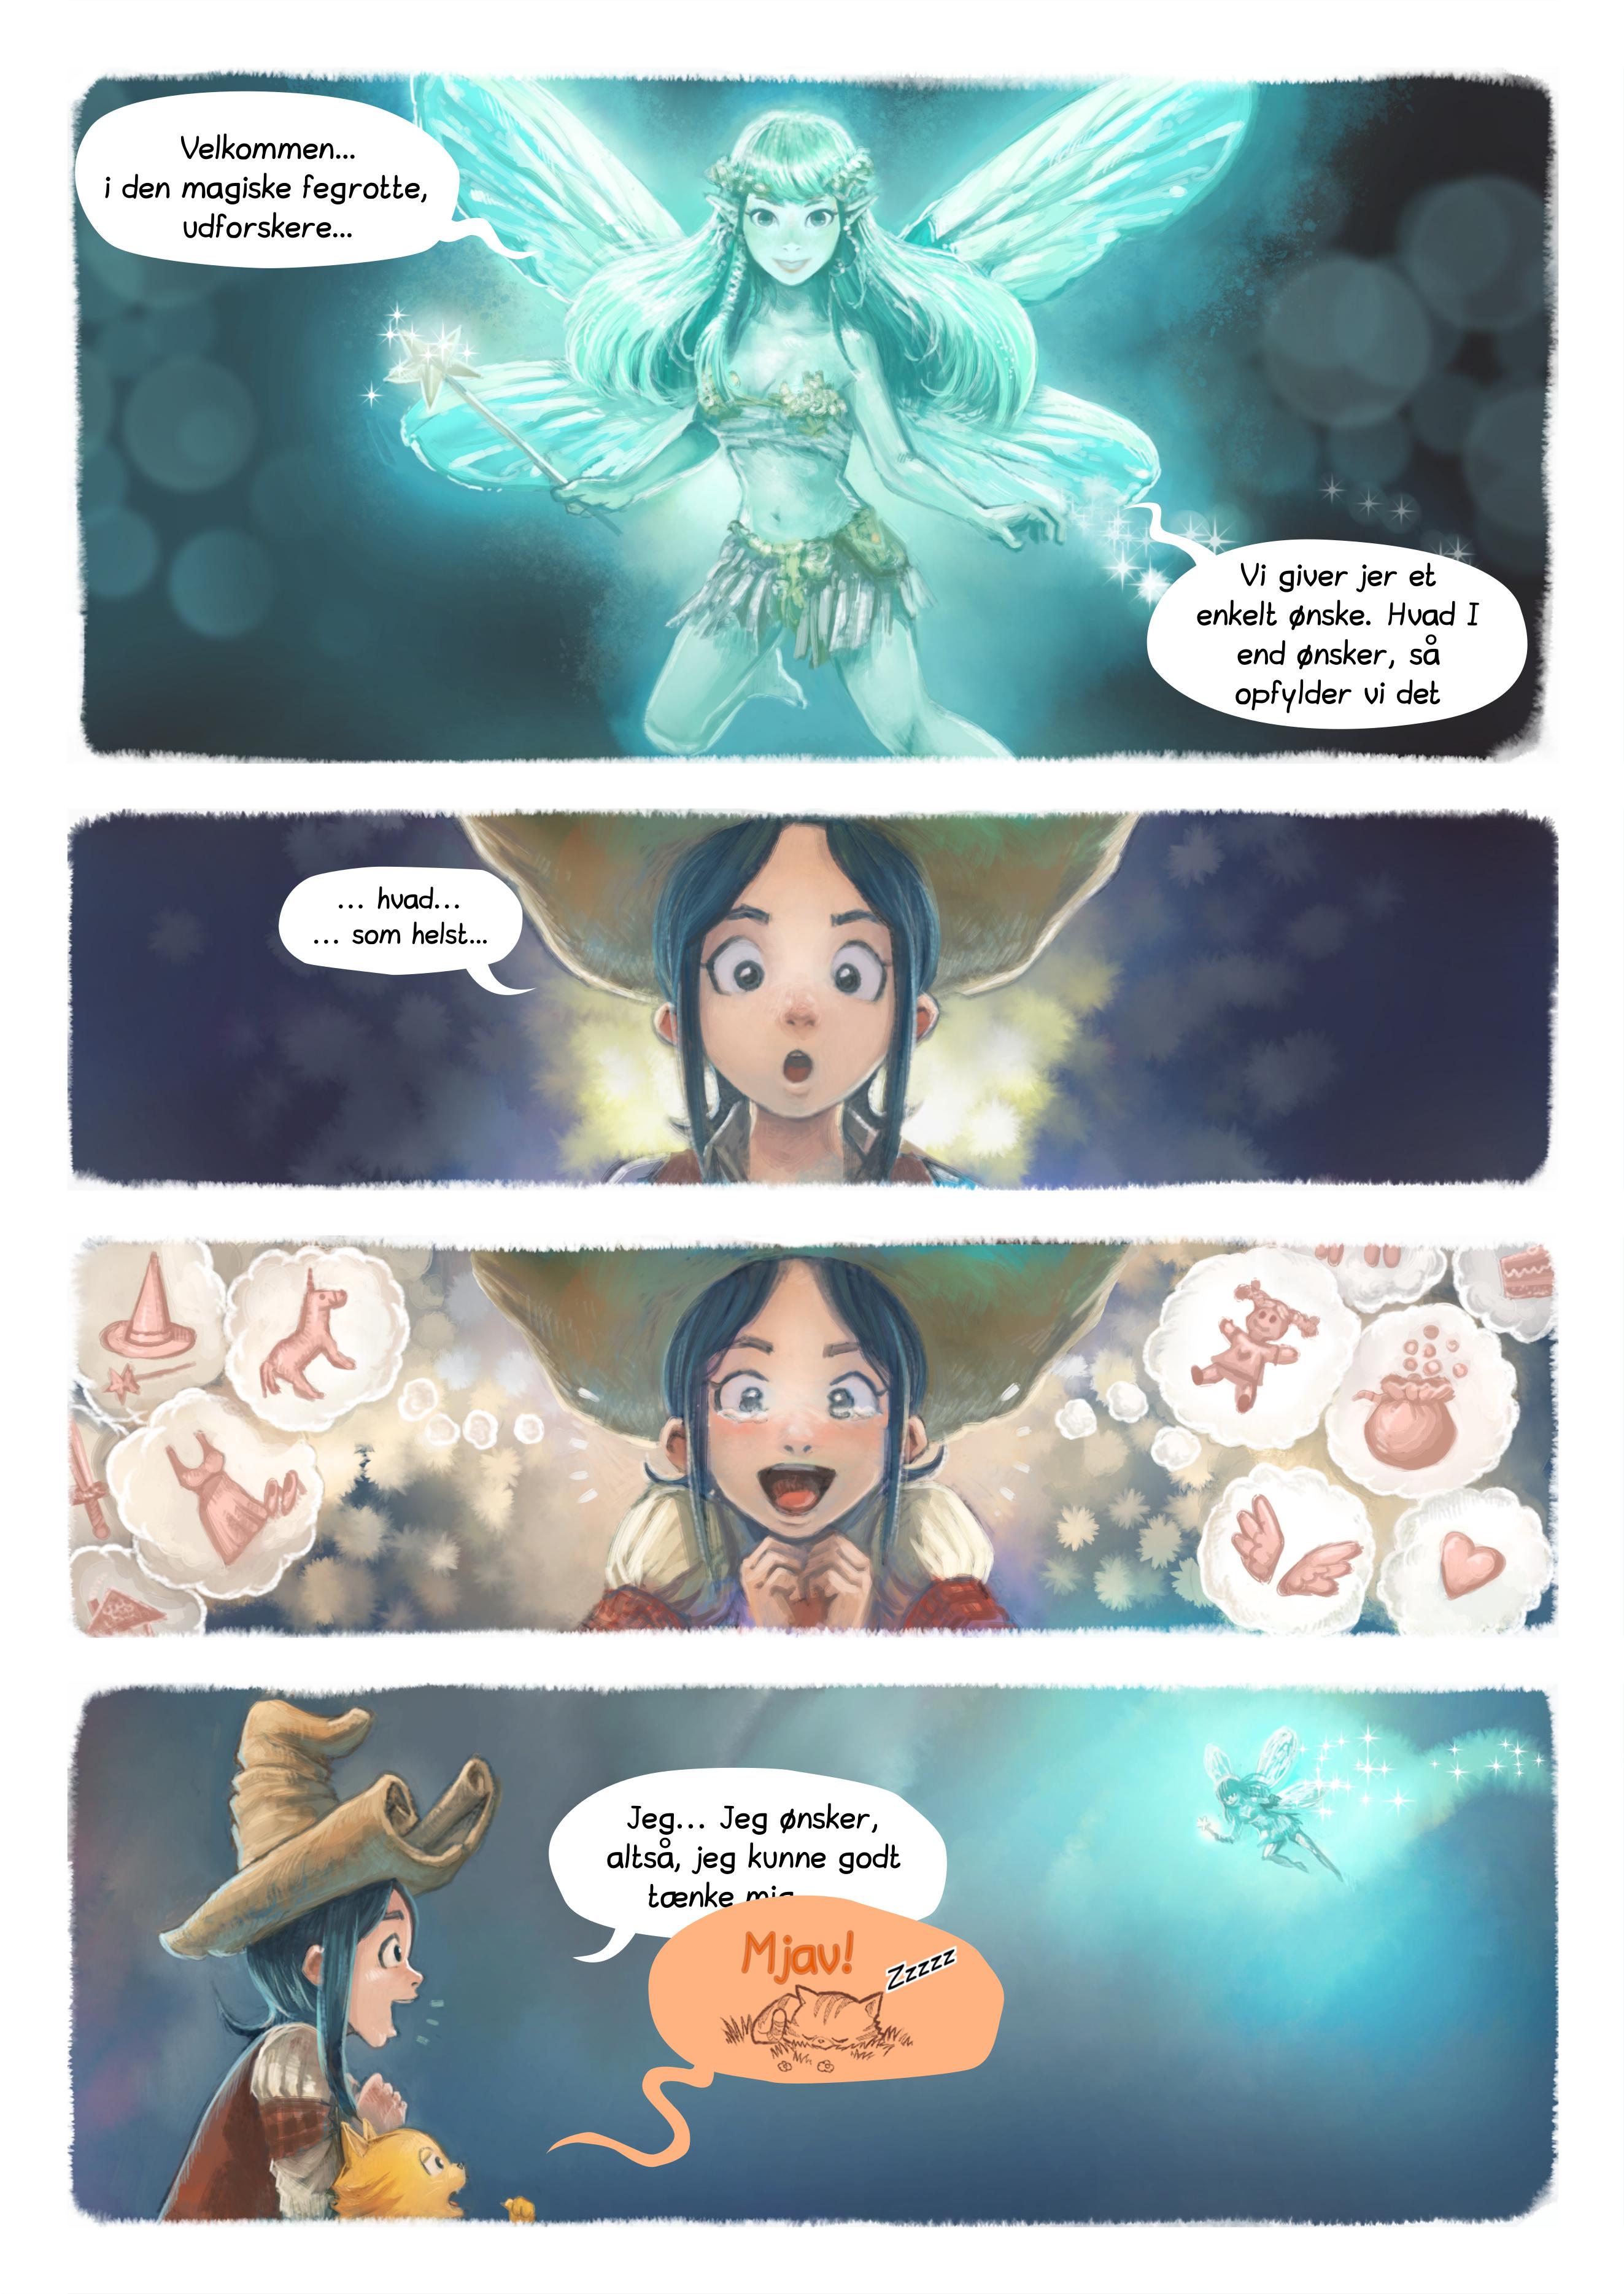 Episode 7: Ønsket, Page 4